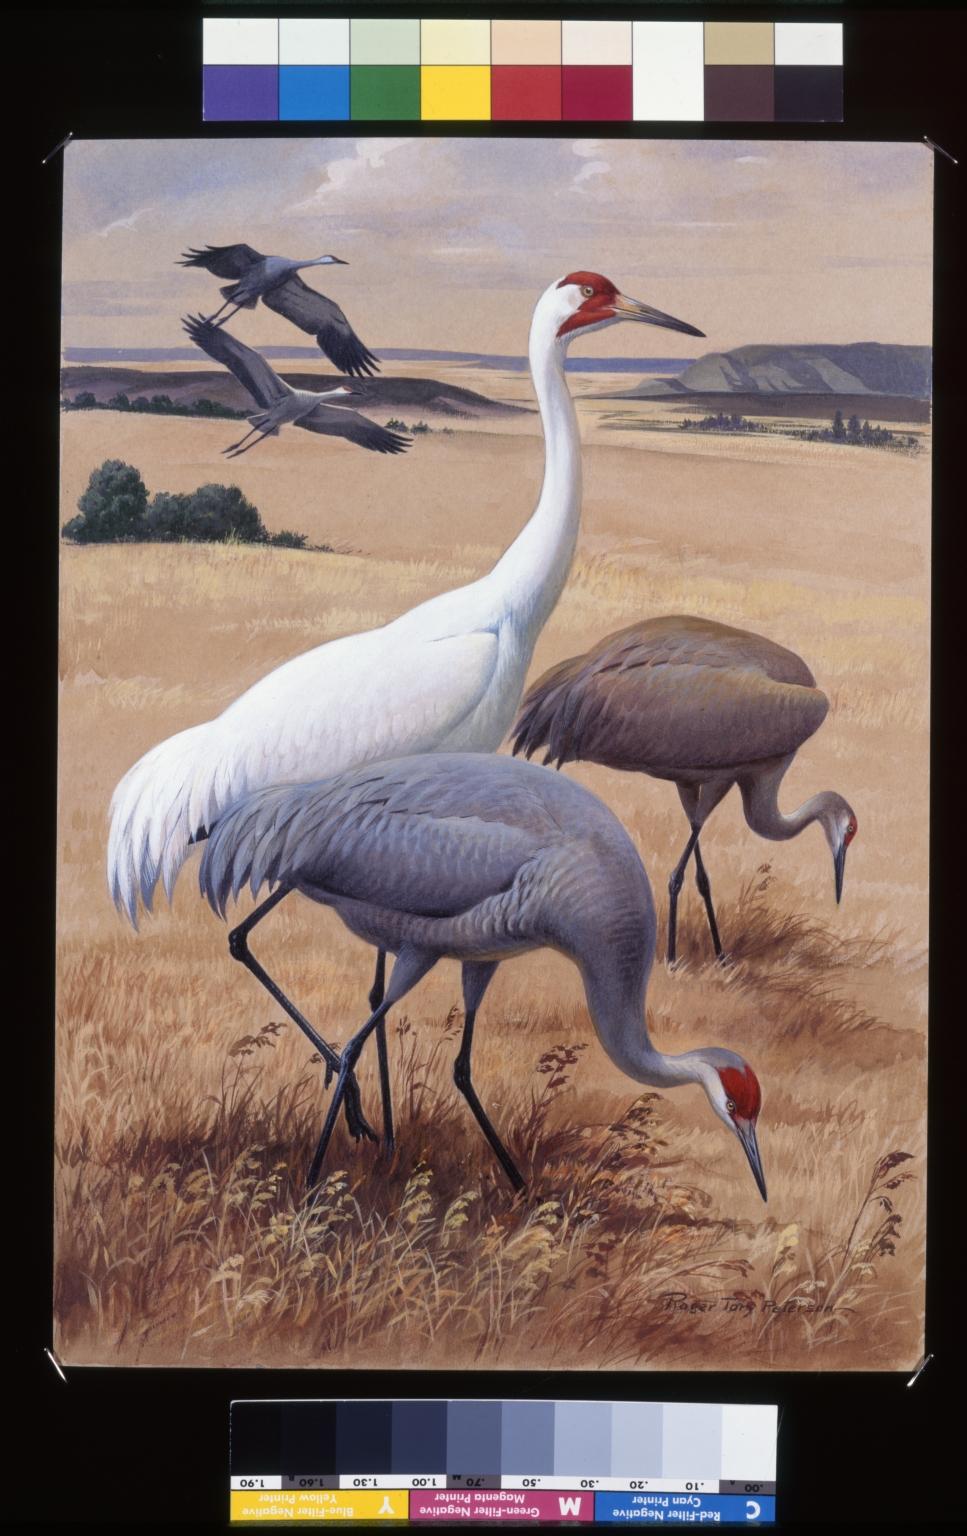 Whooping Crane  and Sandhill Crane.